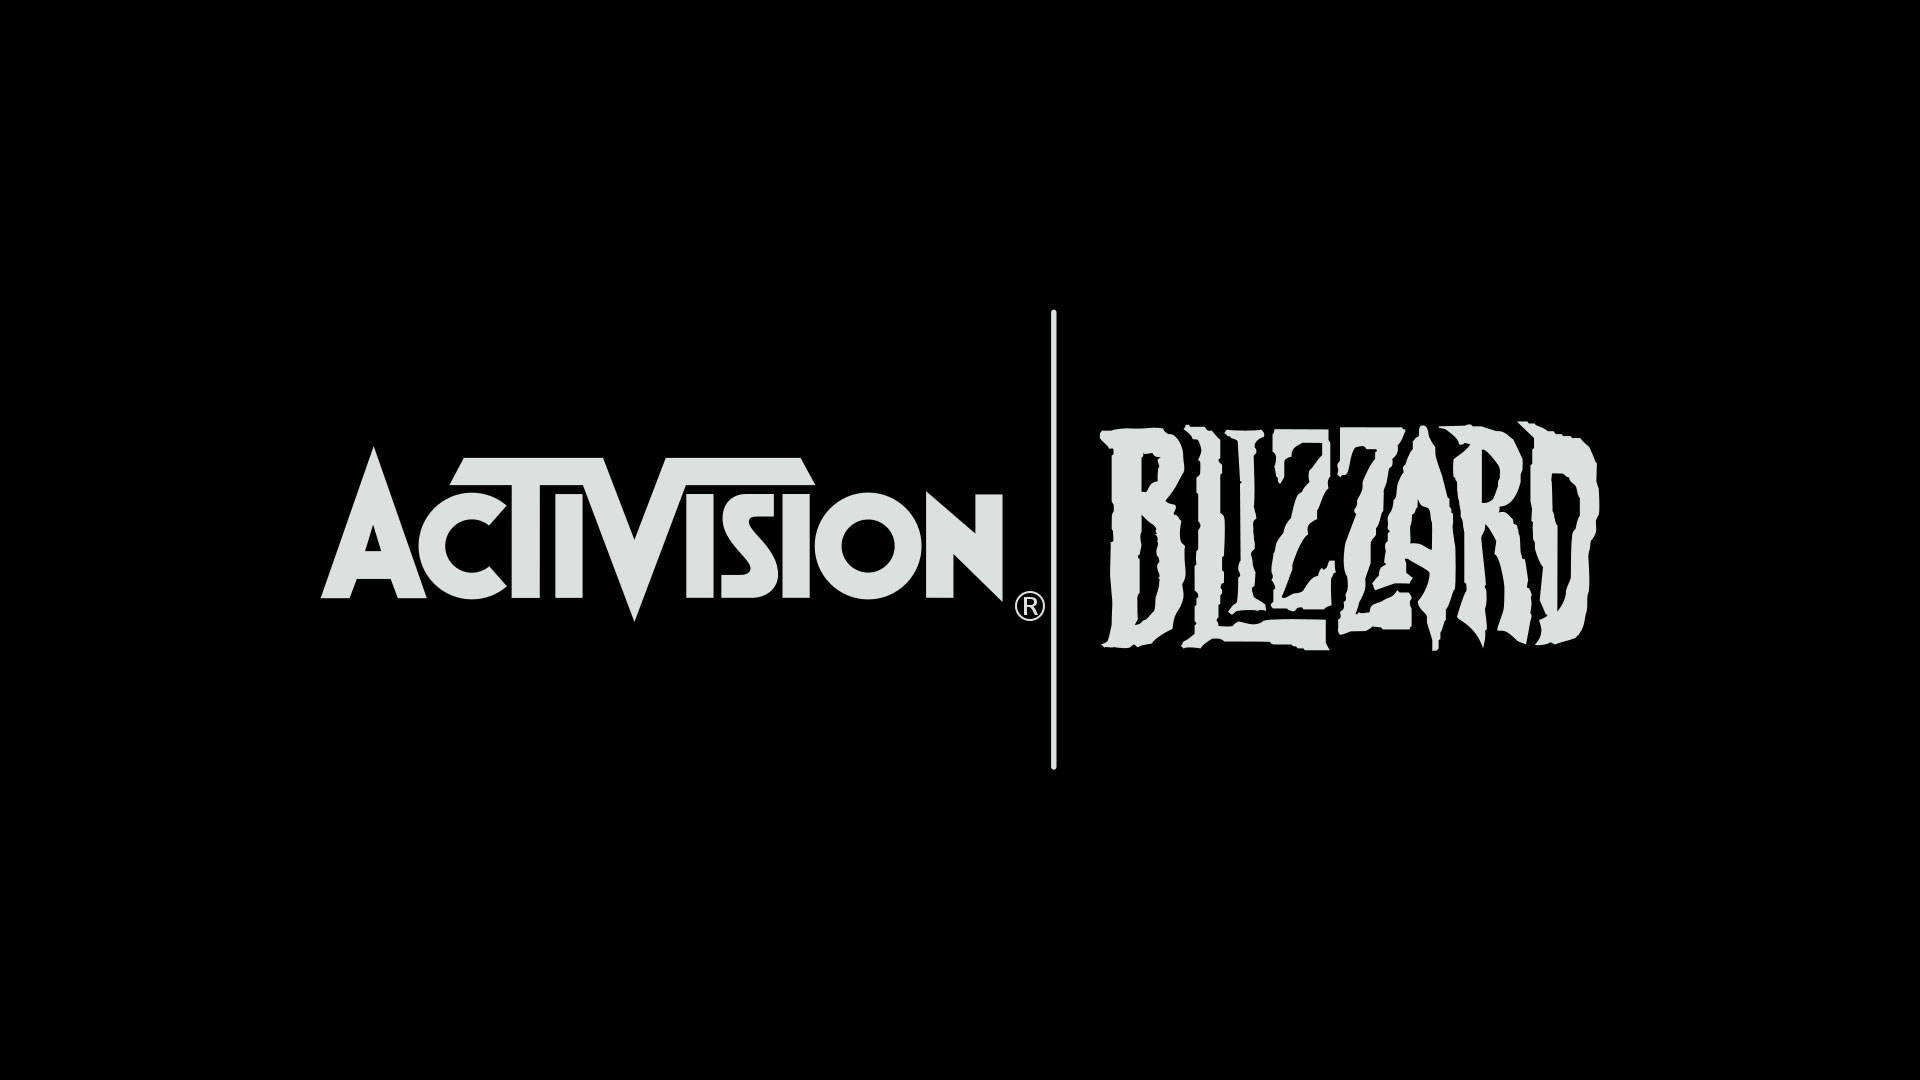 Саудовская Аравия купила акции Electronic Arts, Activision Blizzard и Take-Two Interactive на сумму $3,3 млрд